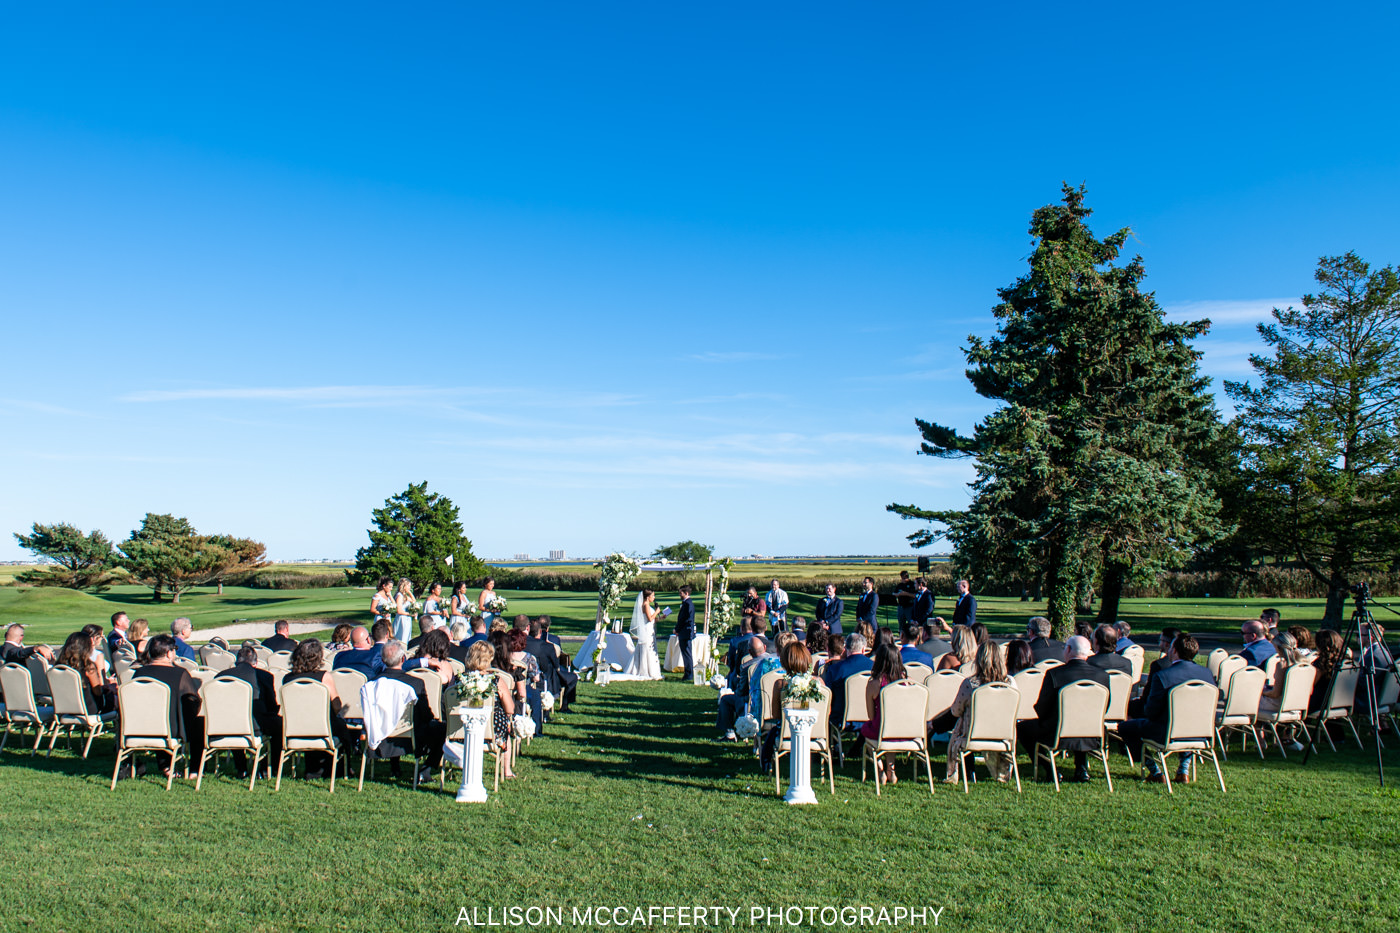 Linwood Country Club Outdoor Wedding Venue